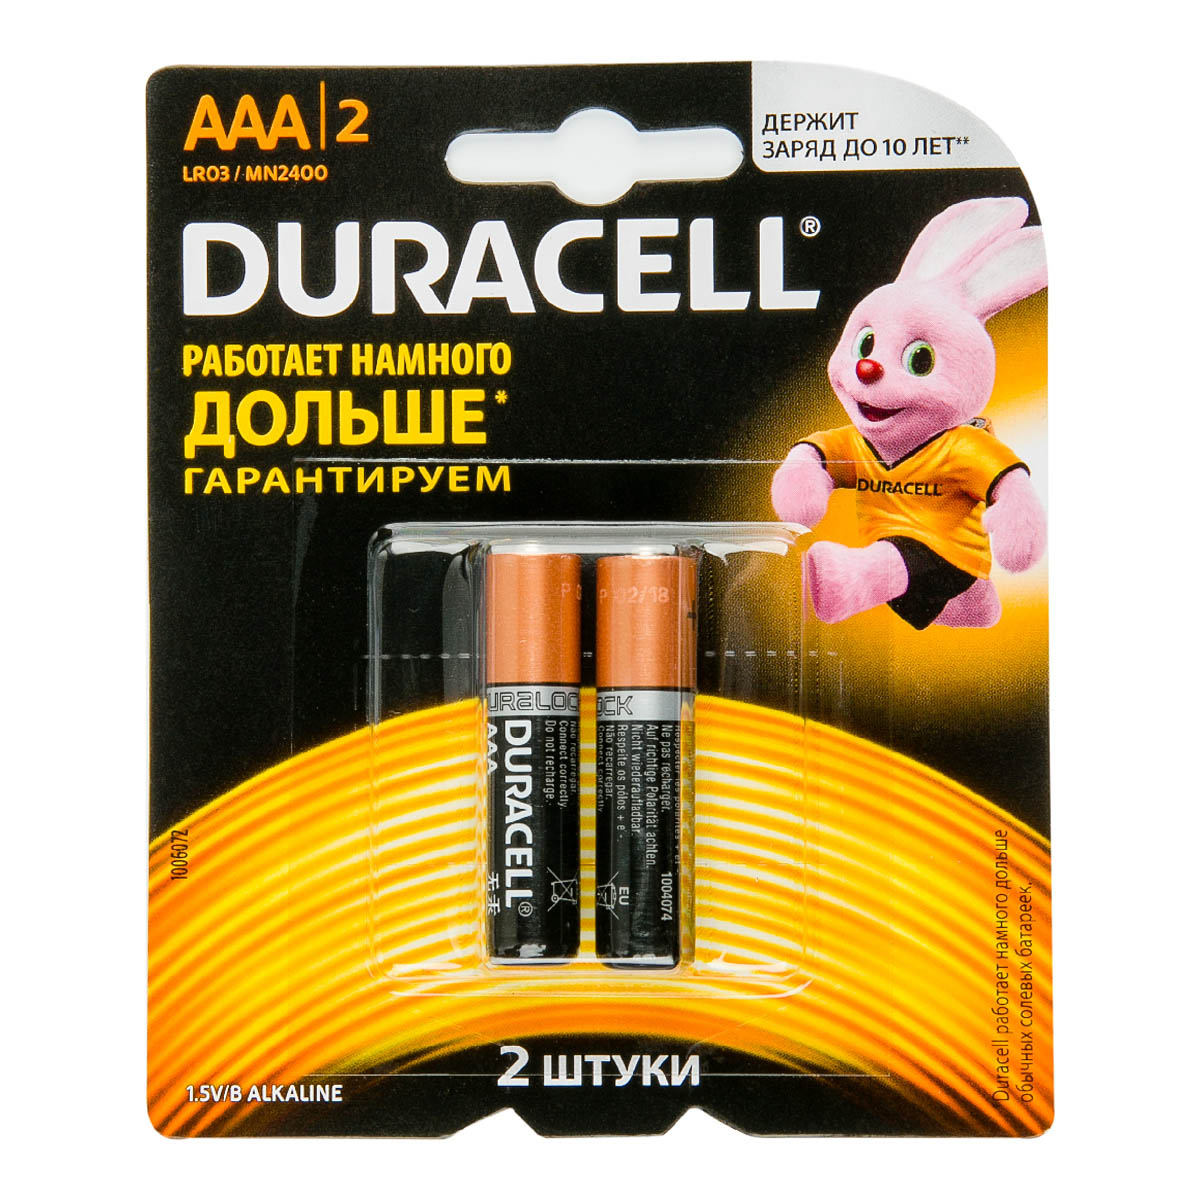 Duracell AAA Basic